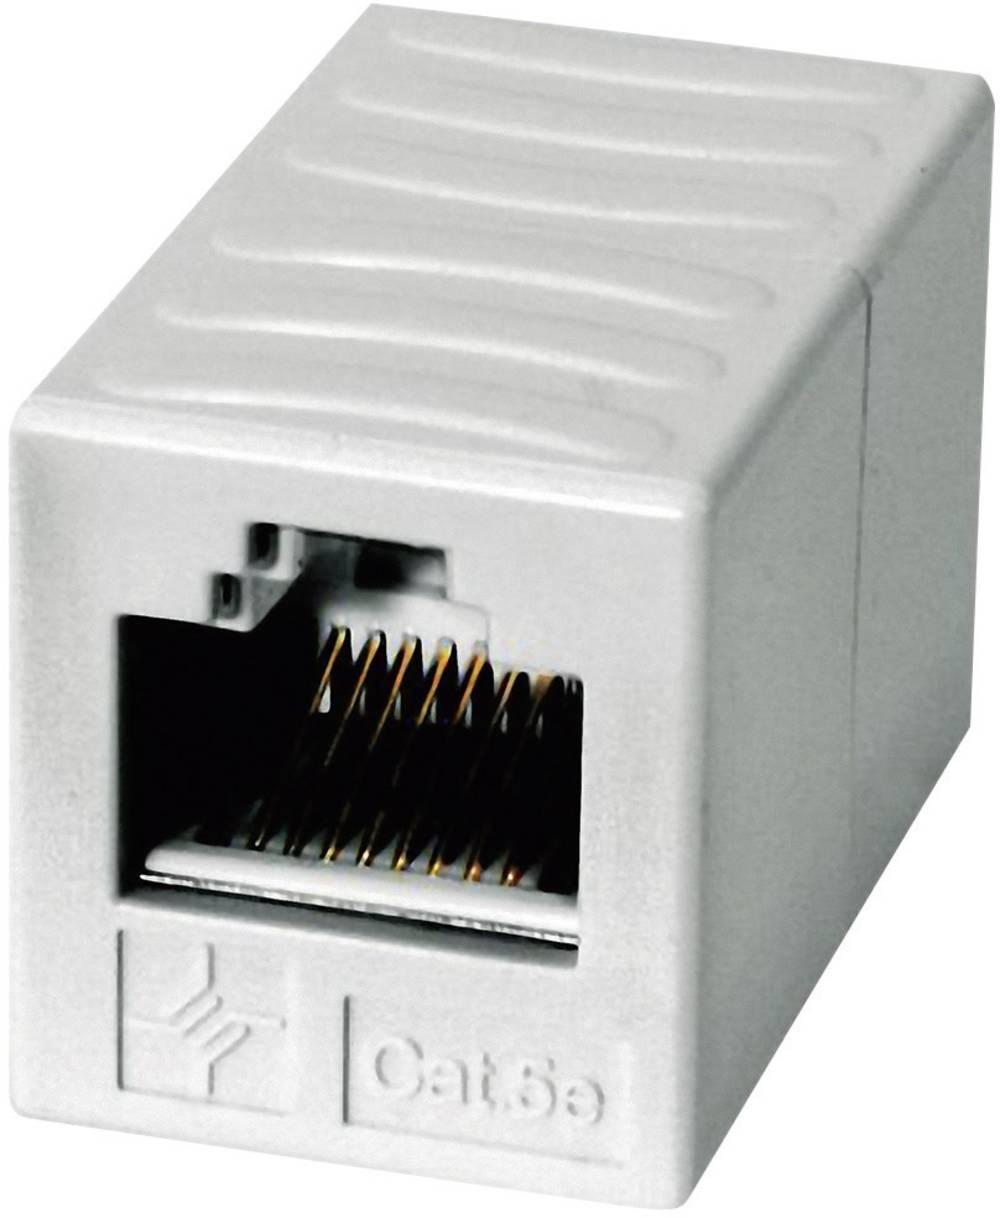 RJ45 omrežni adapter CAT 6 [1x RJ45 vtič - 1x RJ-45 vtič] 0m Alpine Bela Telegärtner J00029A0062